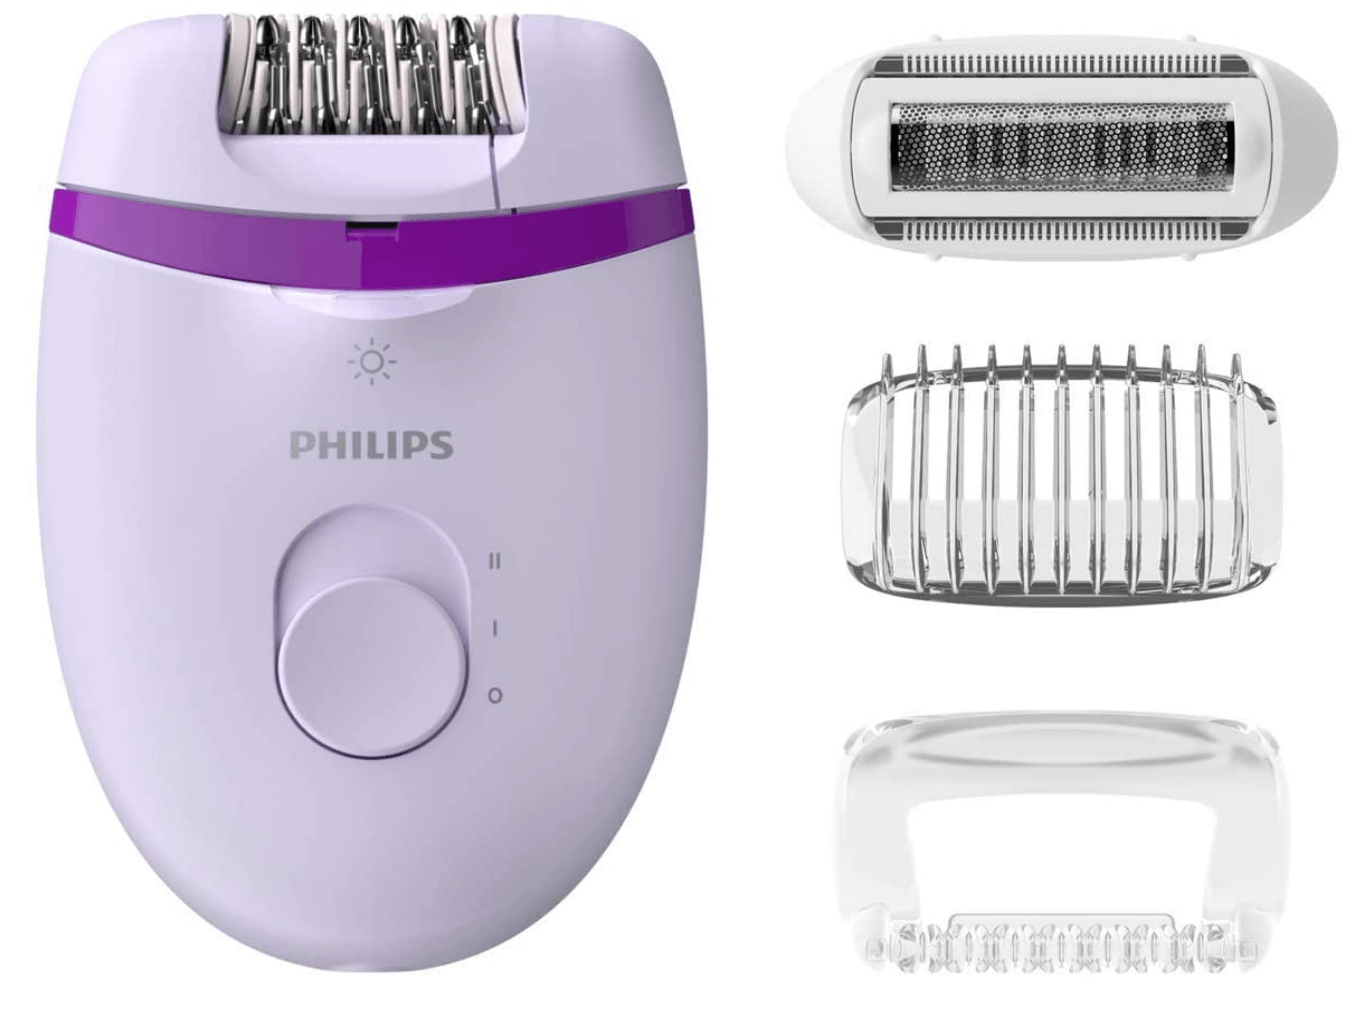 Philips Depiladora Satinelle Essential BRE275/00